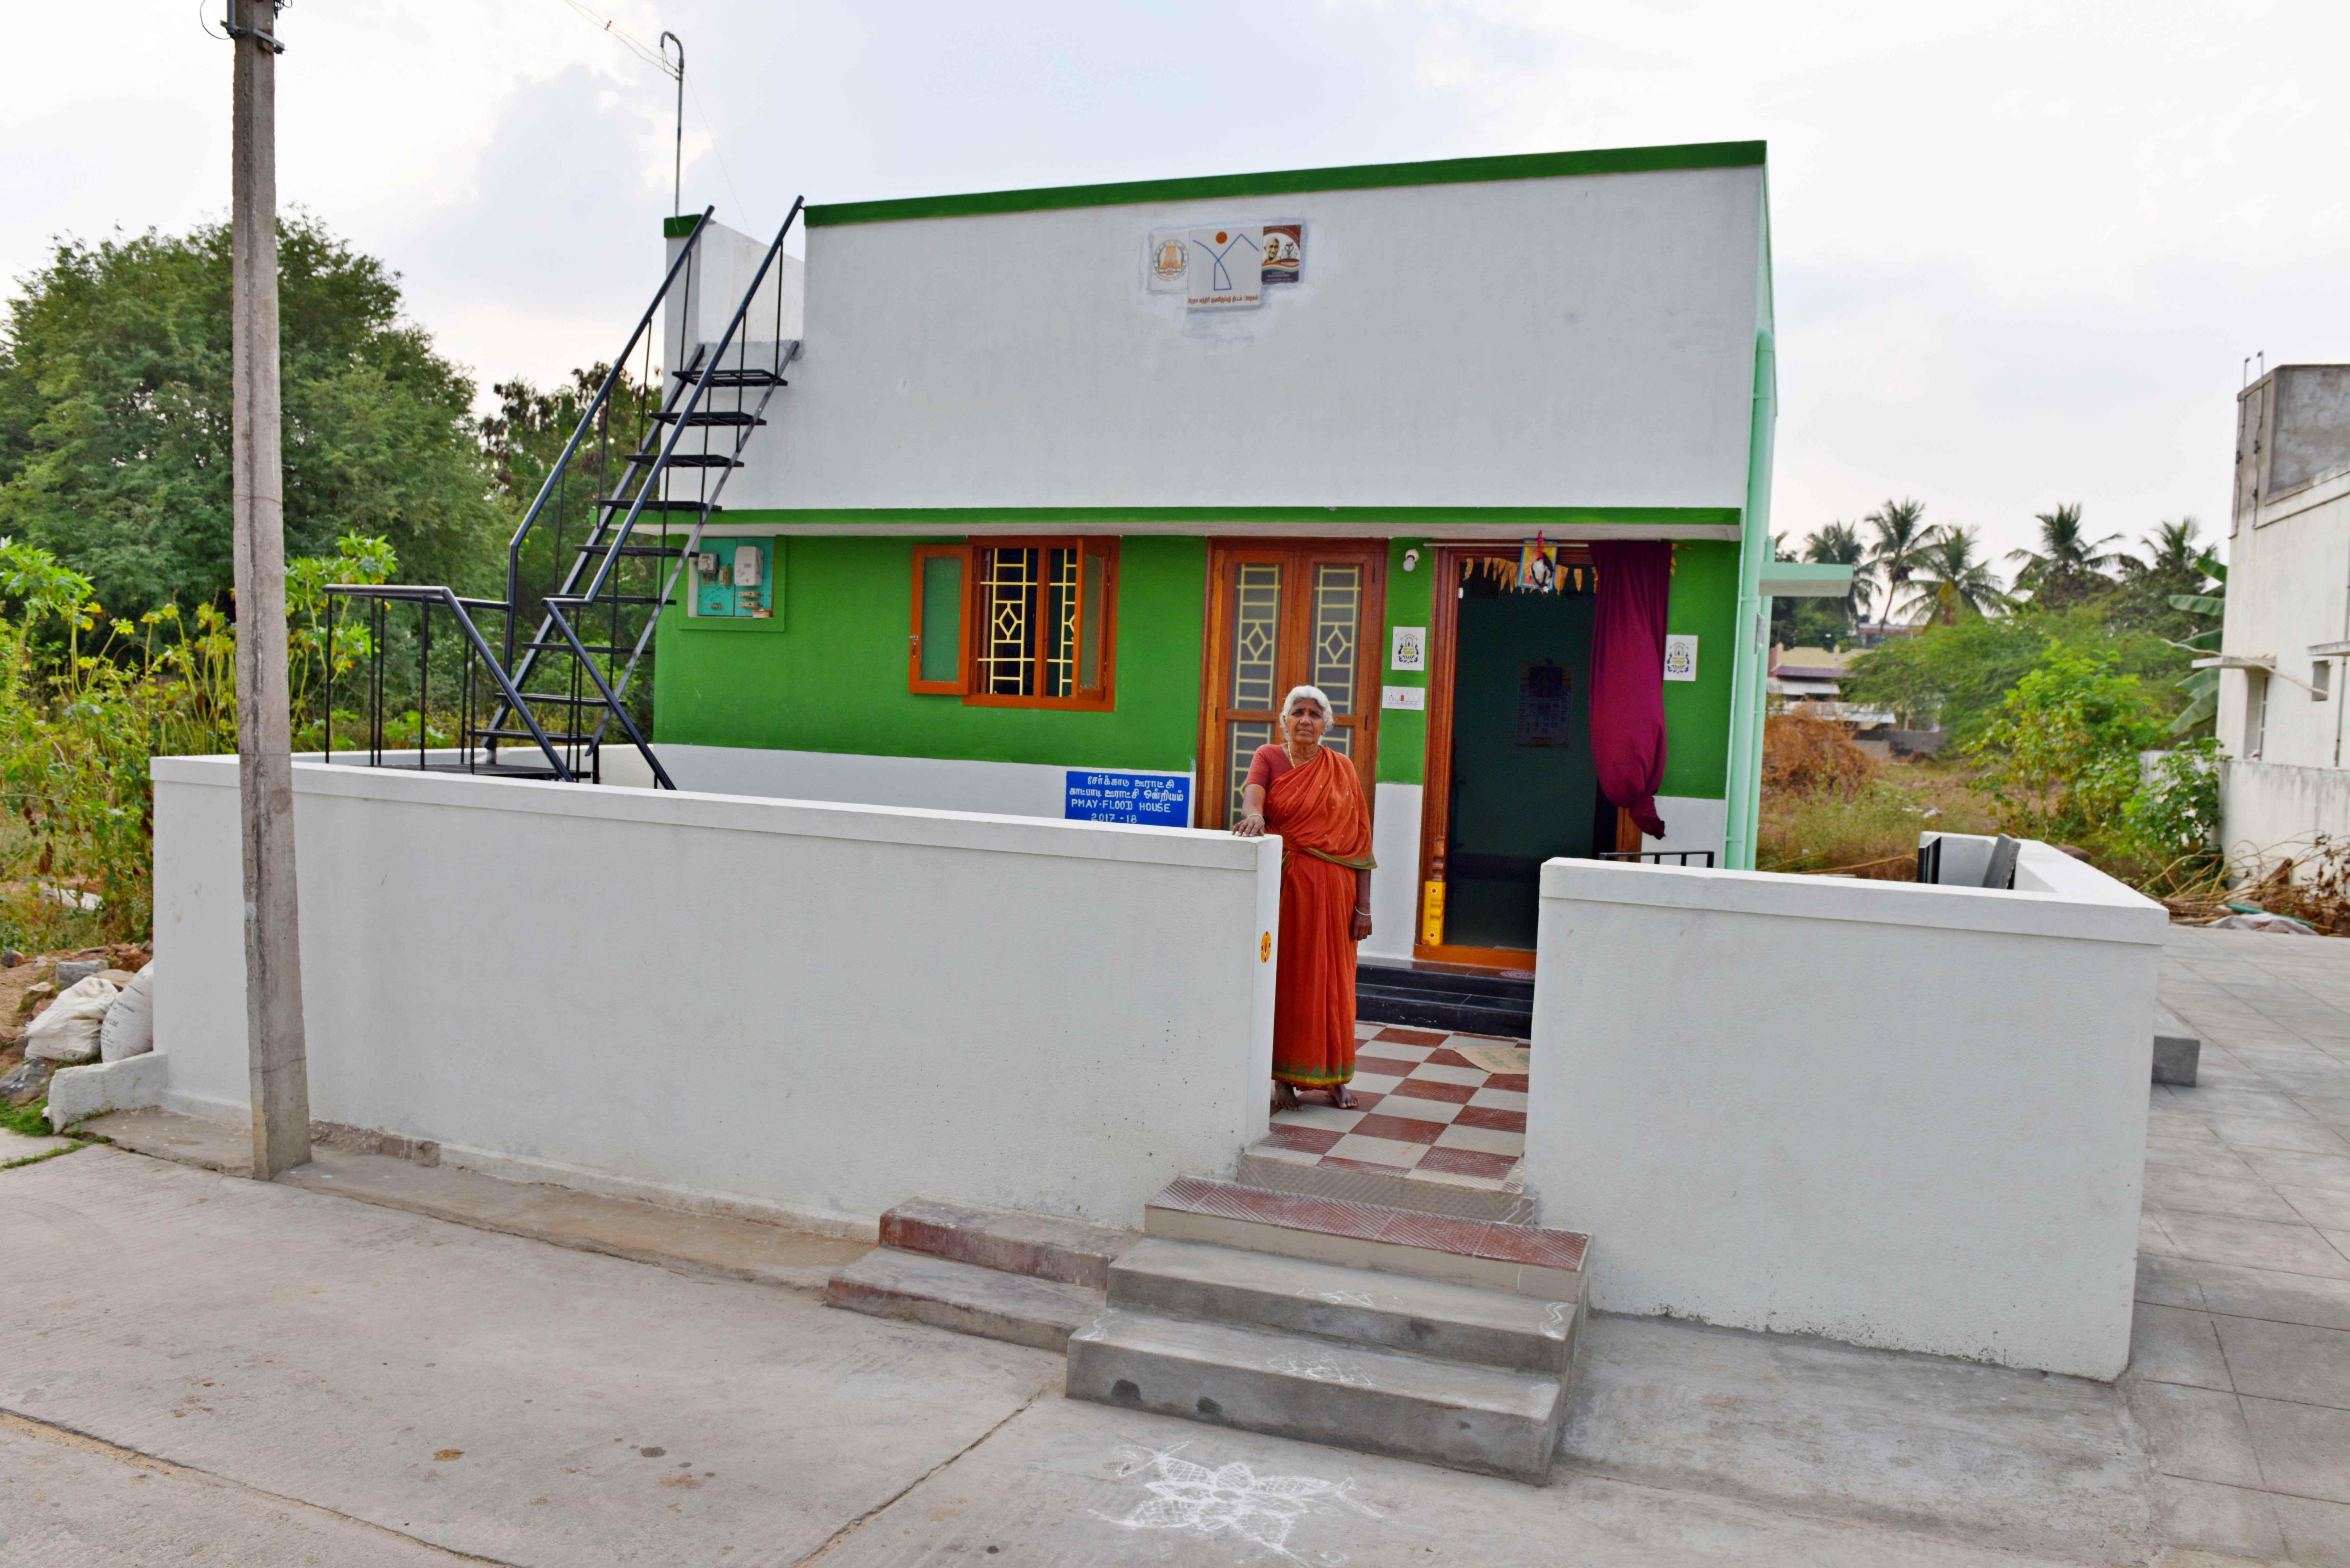 PMAY-G House-(Smt. Parwati-2017-18-G.P.-Serkadu, Block-Katpadi, Dist. Vellore, Tamilnadu